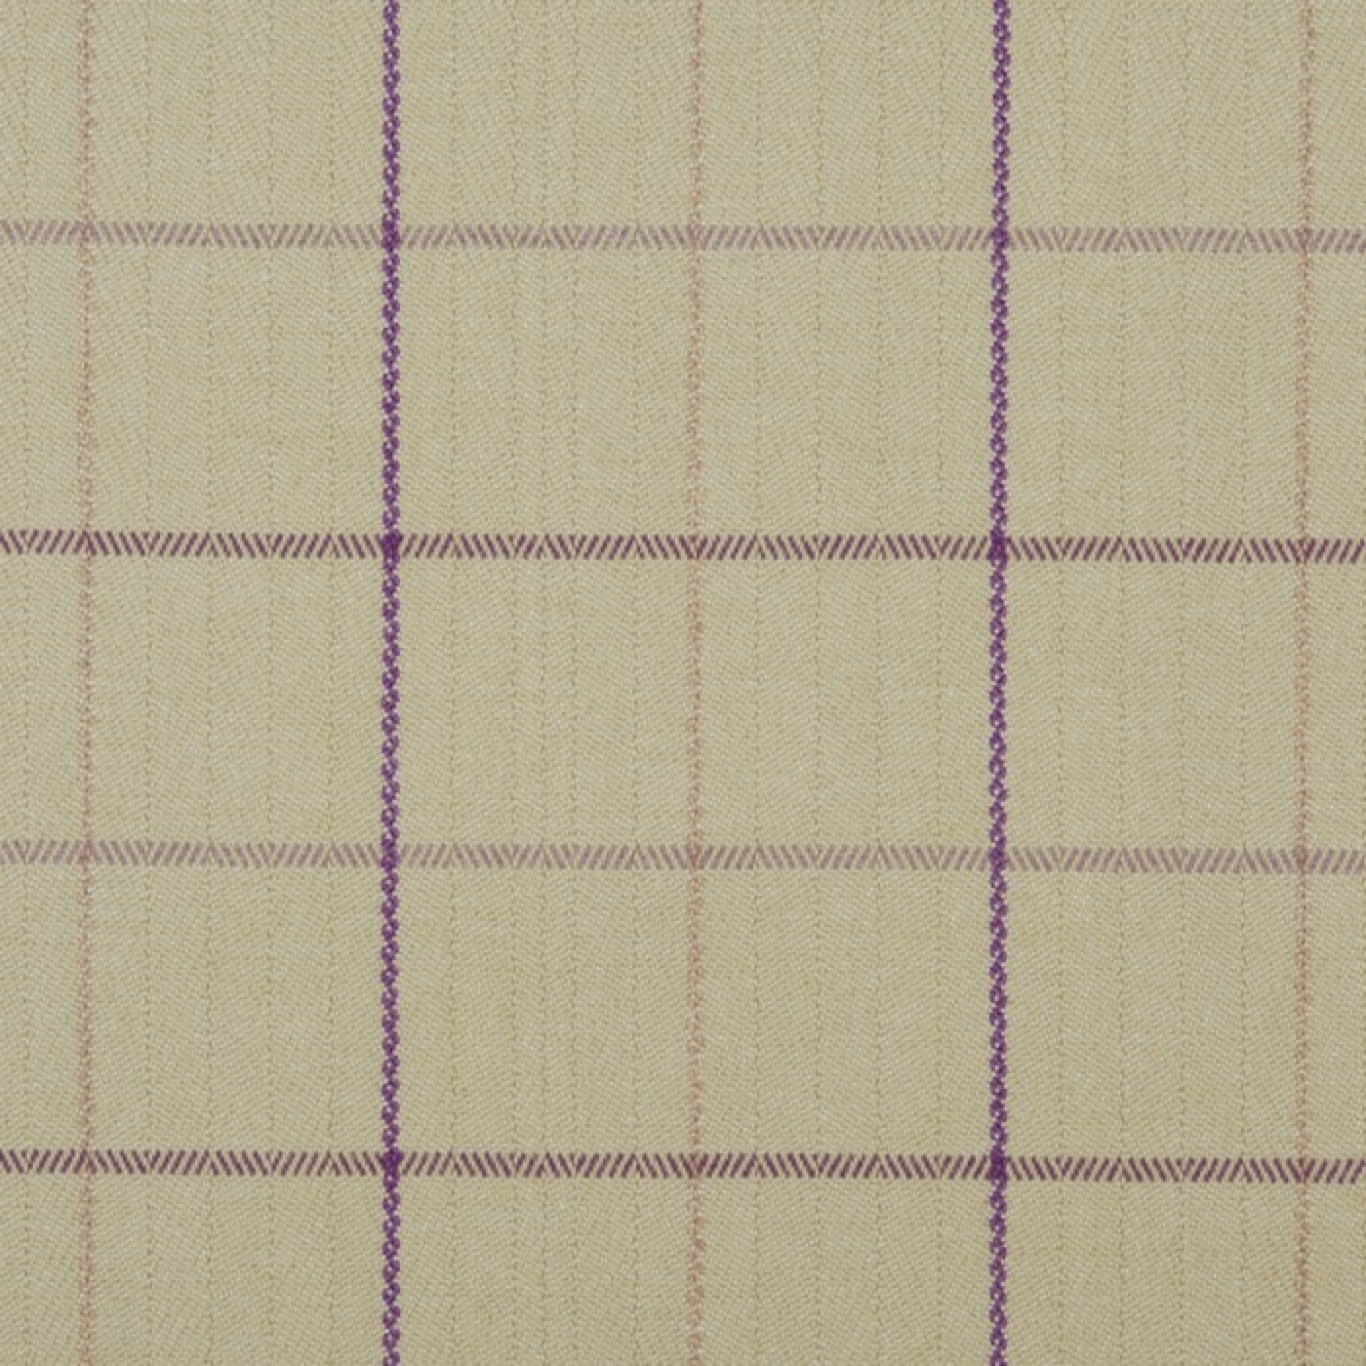 Image of Prestigious Brodie Thistle Fabric